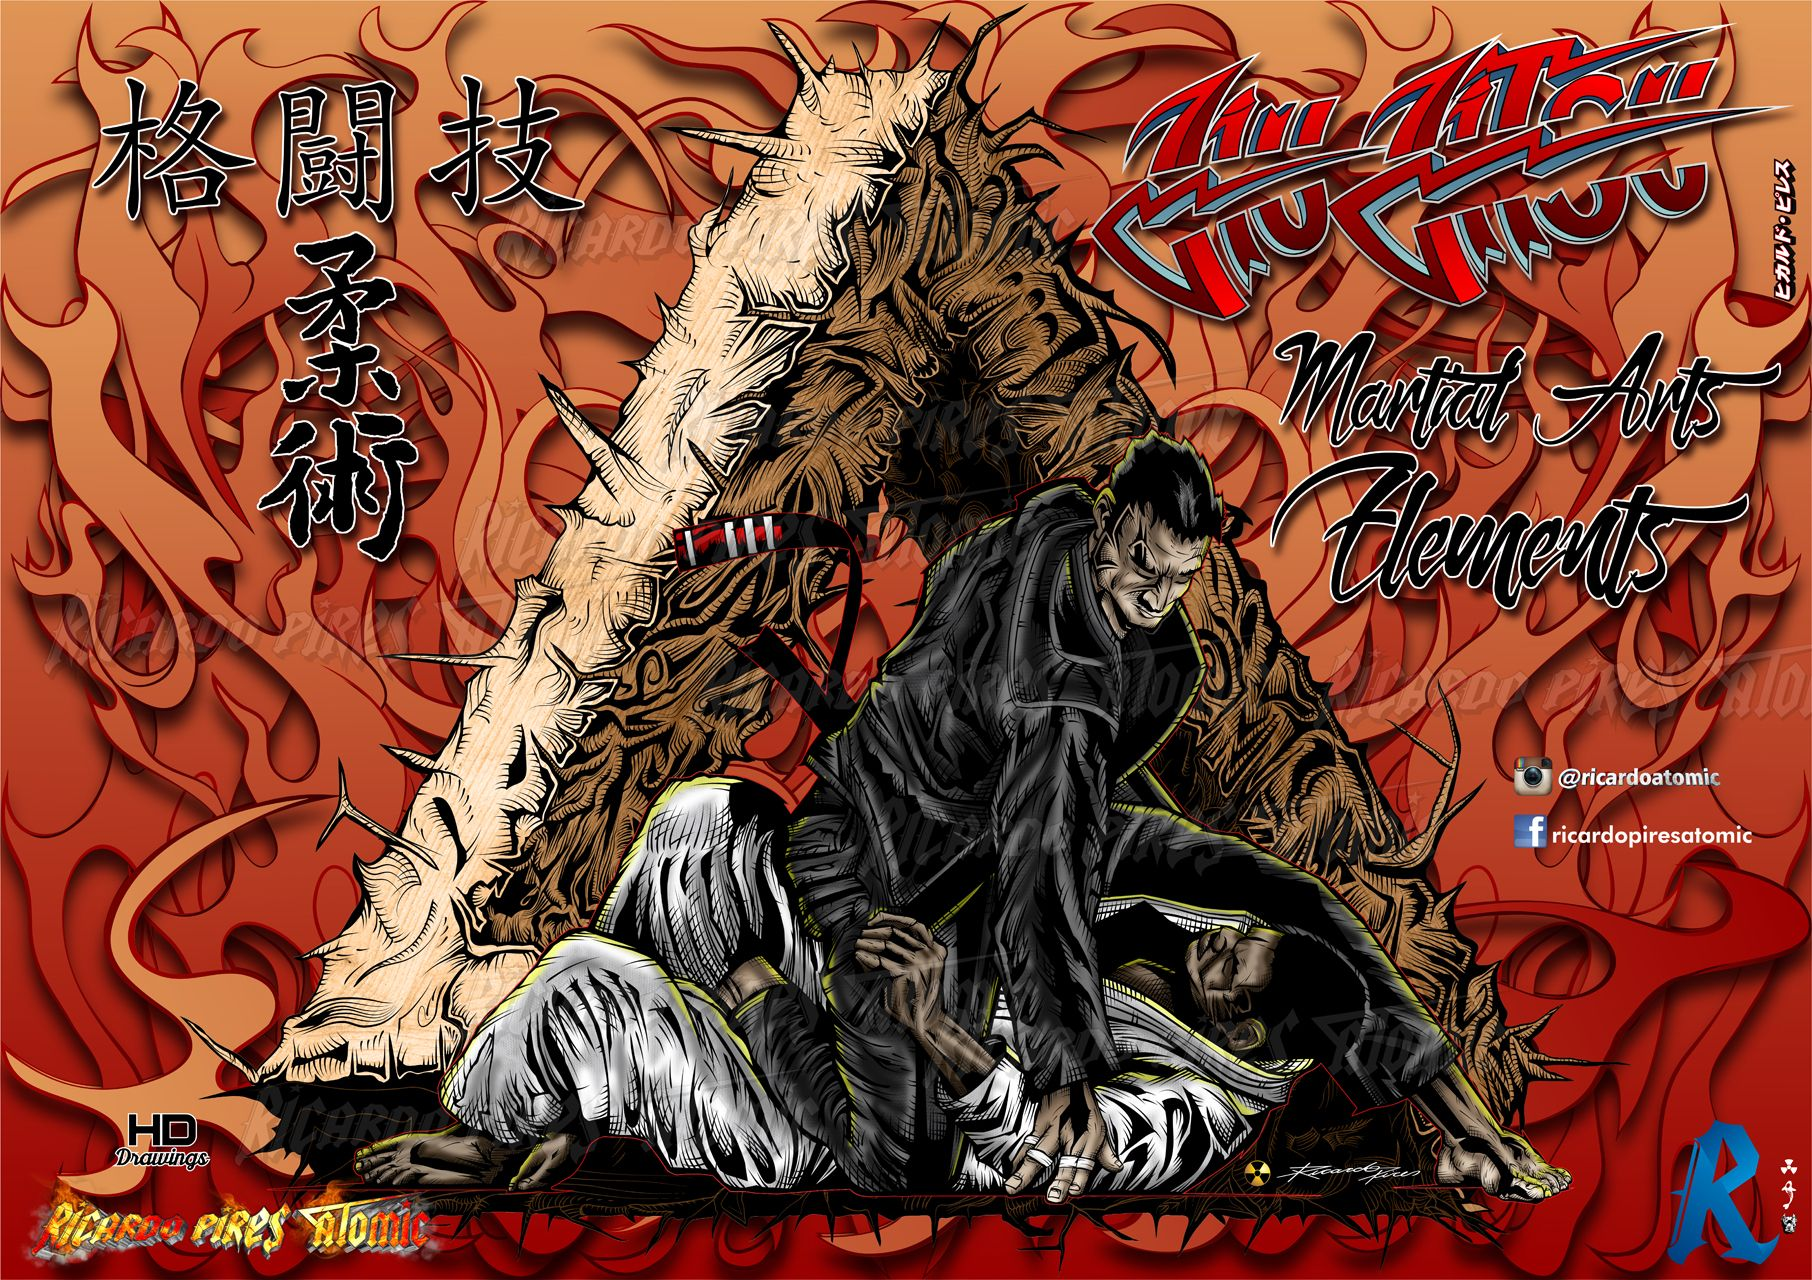 Jiu Jitsu Martial Arts Elements Fighters Exclusive Drawings For Sale High Resolution Easy Manipulation Support If Y Jiu Jitsu Tattoo Jiu Jitsu Martial Arts